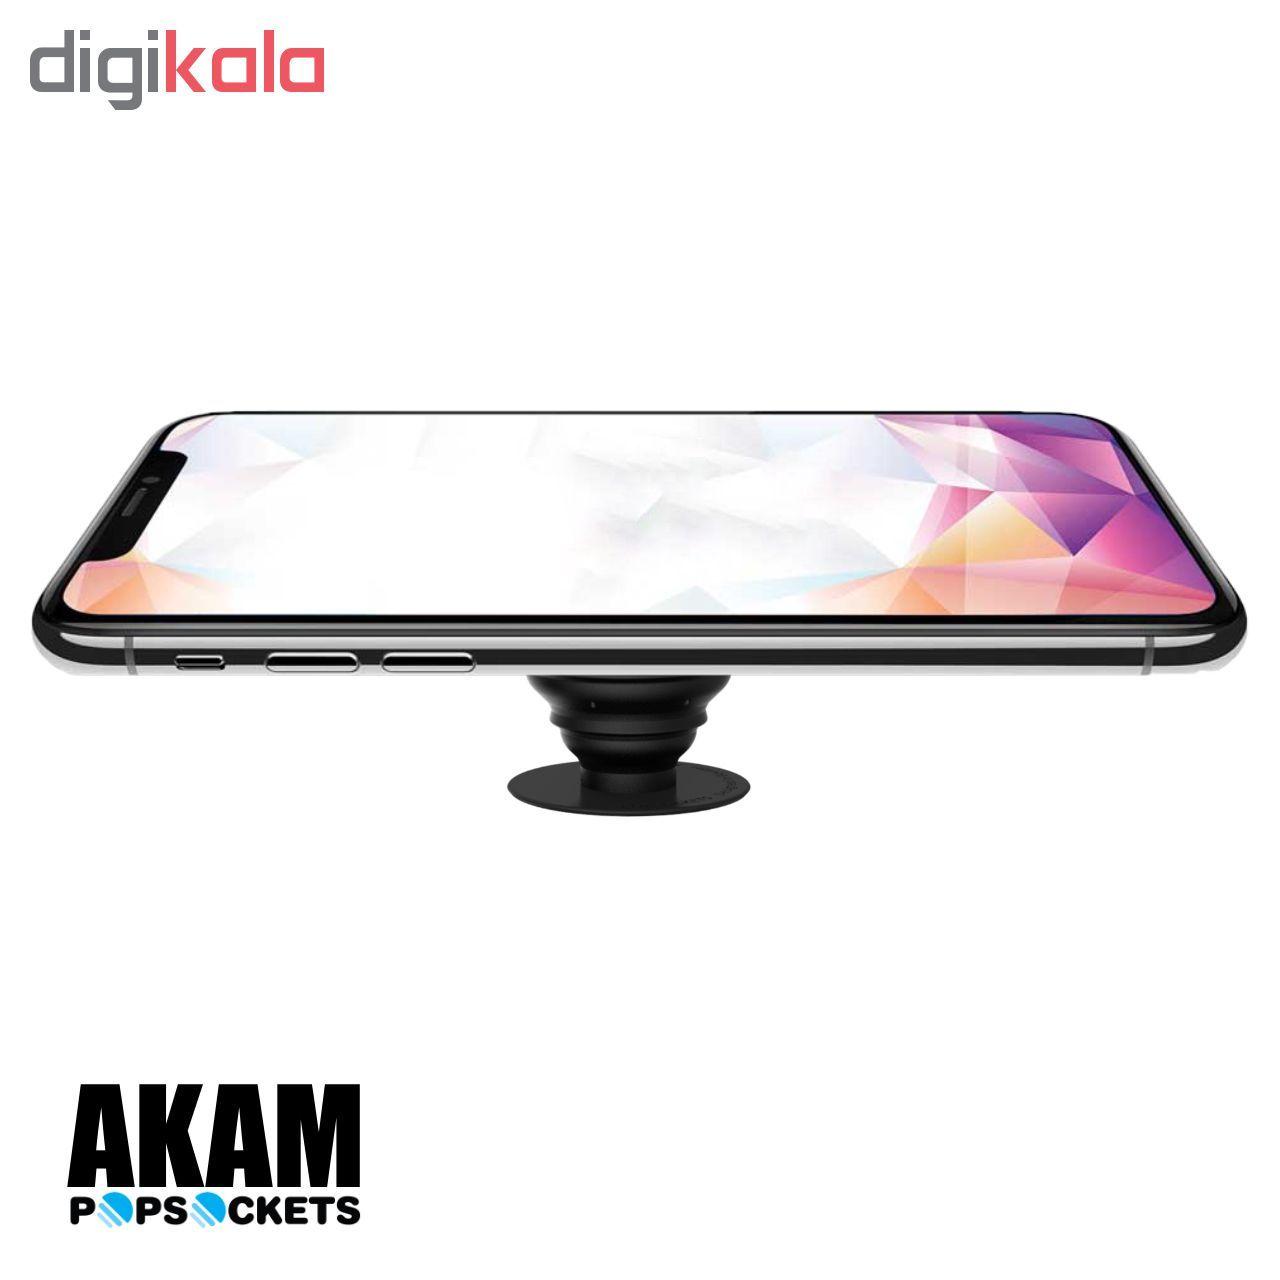 پایه نگهدارنده گوشی موبایل پاپ سوکت آکام مدل APS0054 main 1 10